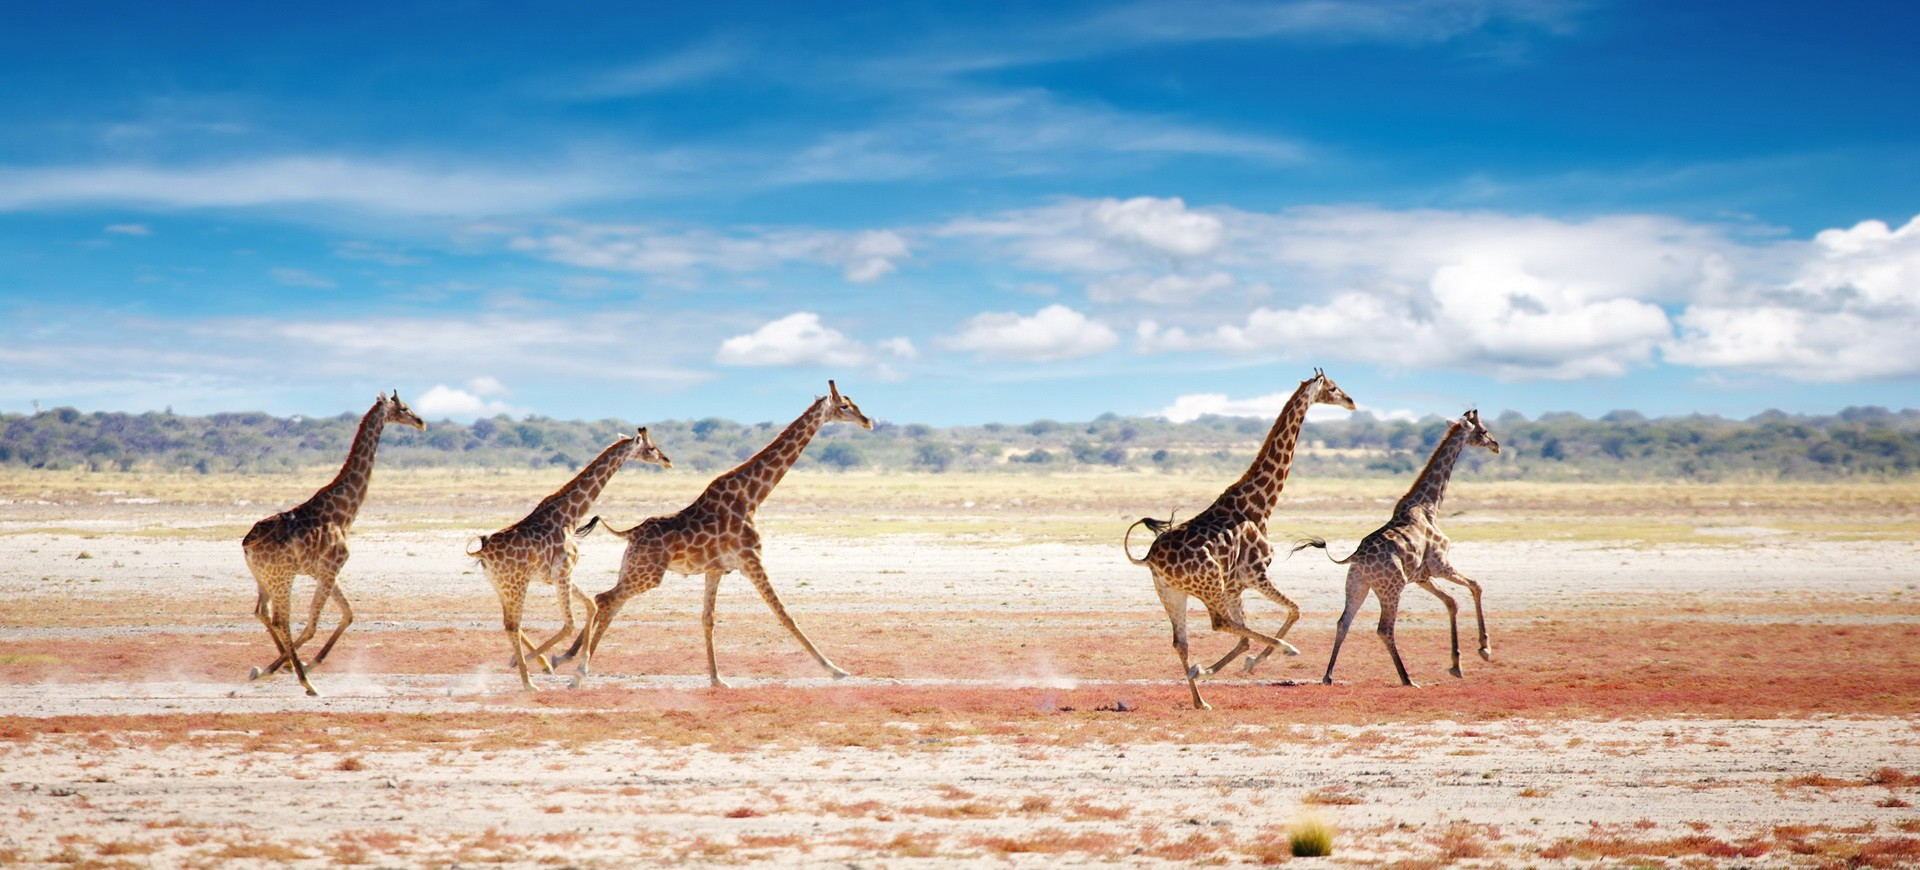 Namibie Etosha Girafes